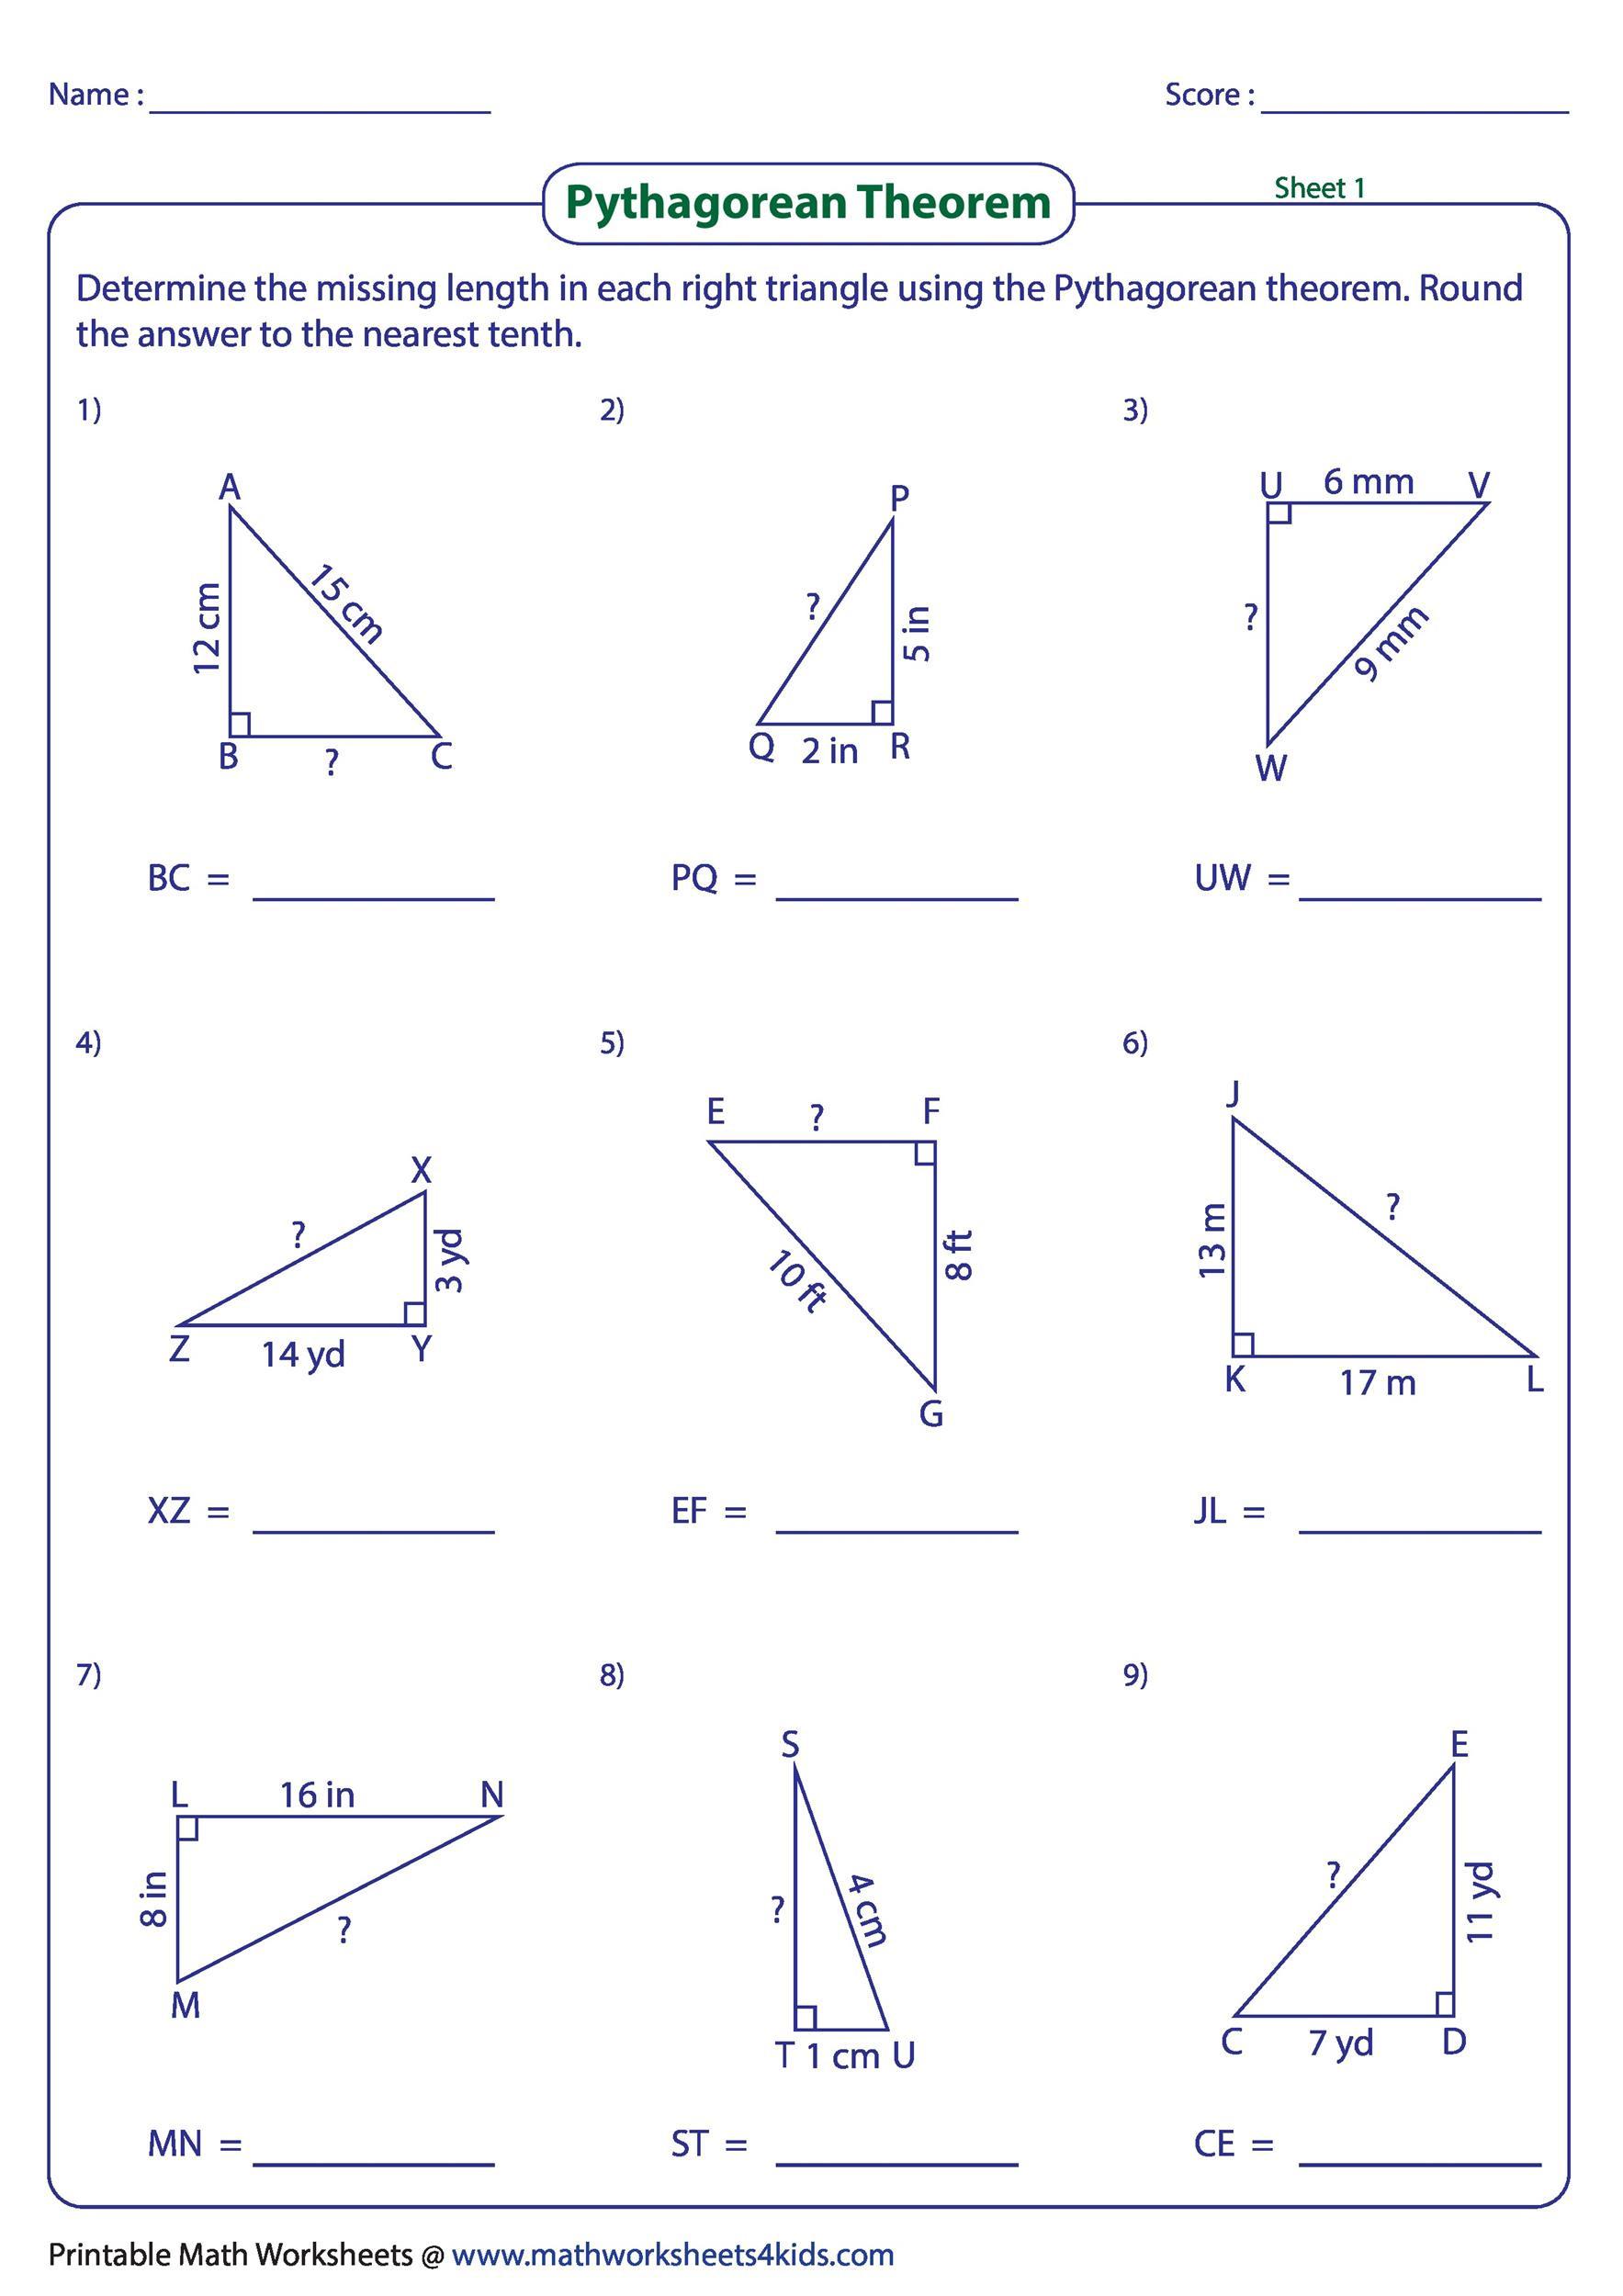 Area Of Rhombus Worksheet 34 Pythagorean theorem Worksheet Answer Key Worksheet